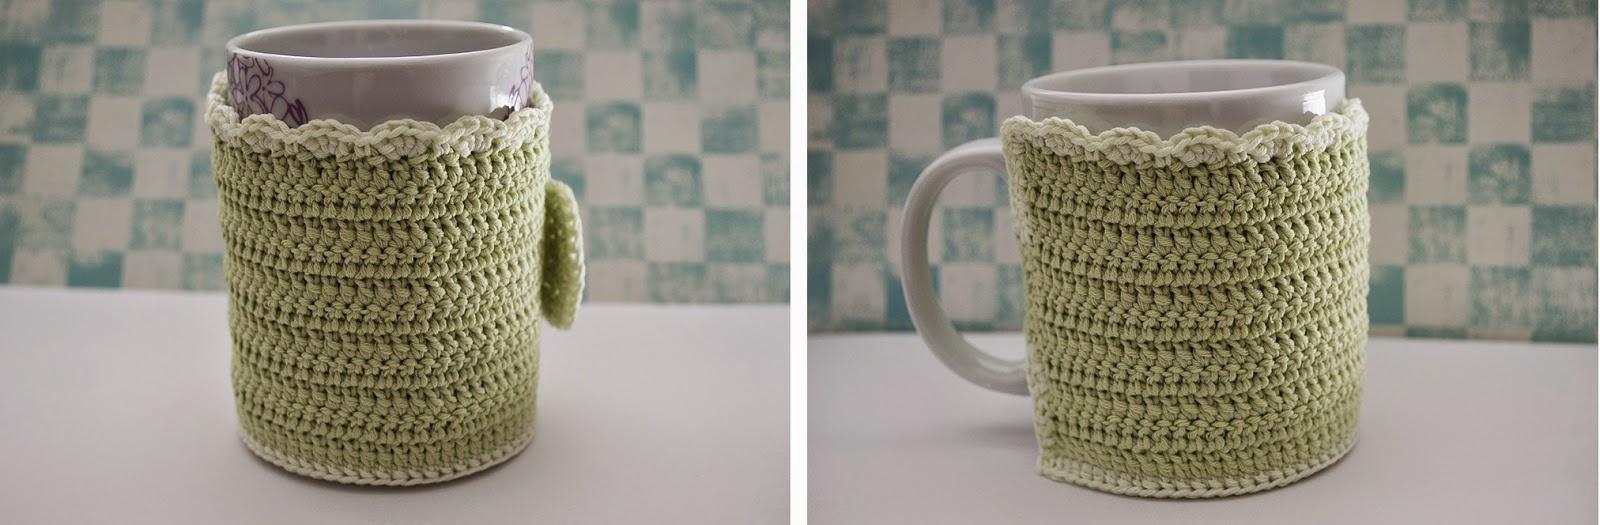 Funda verde de ganchillo para taza